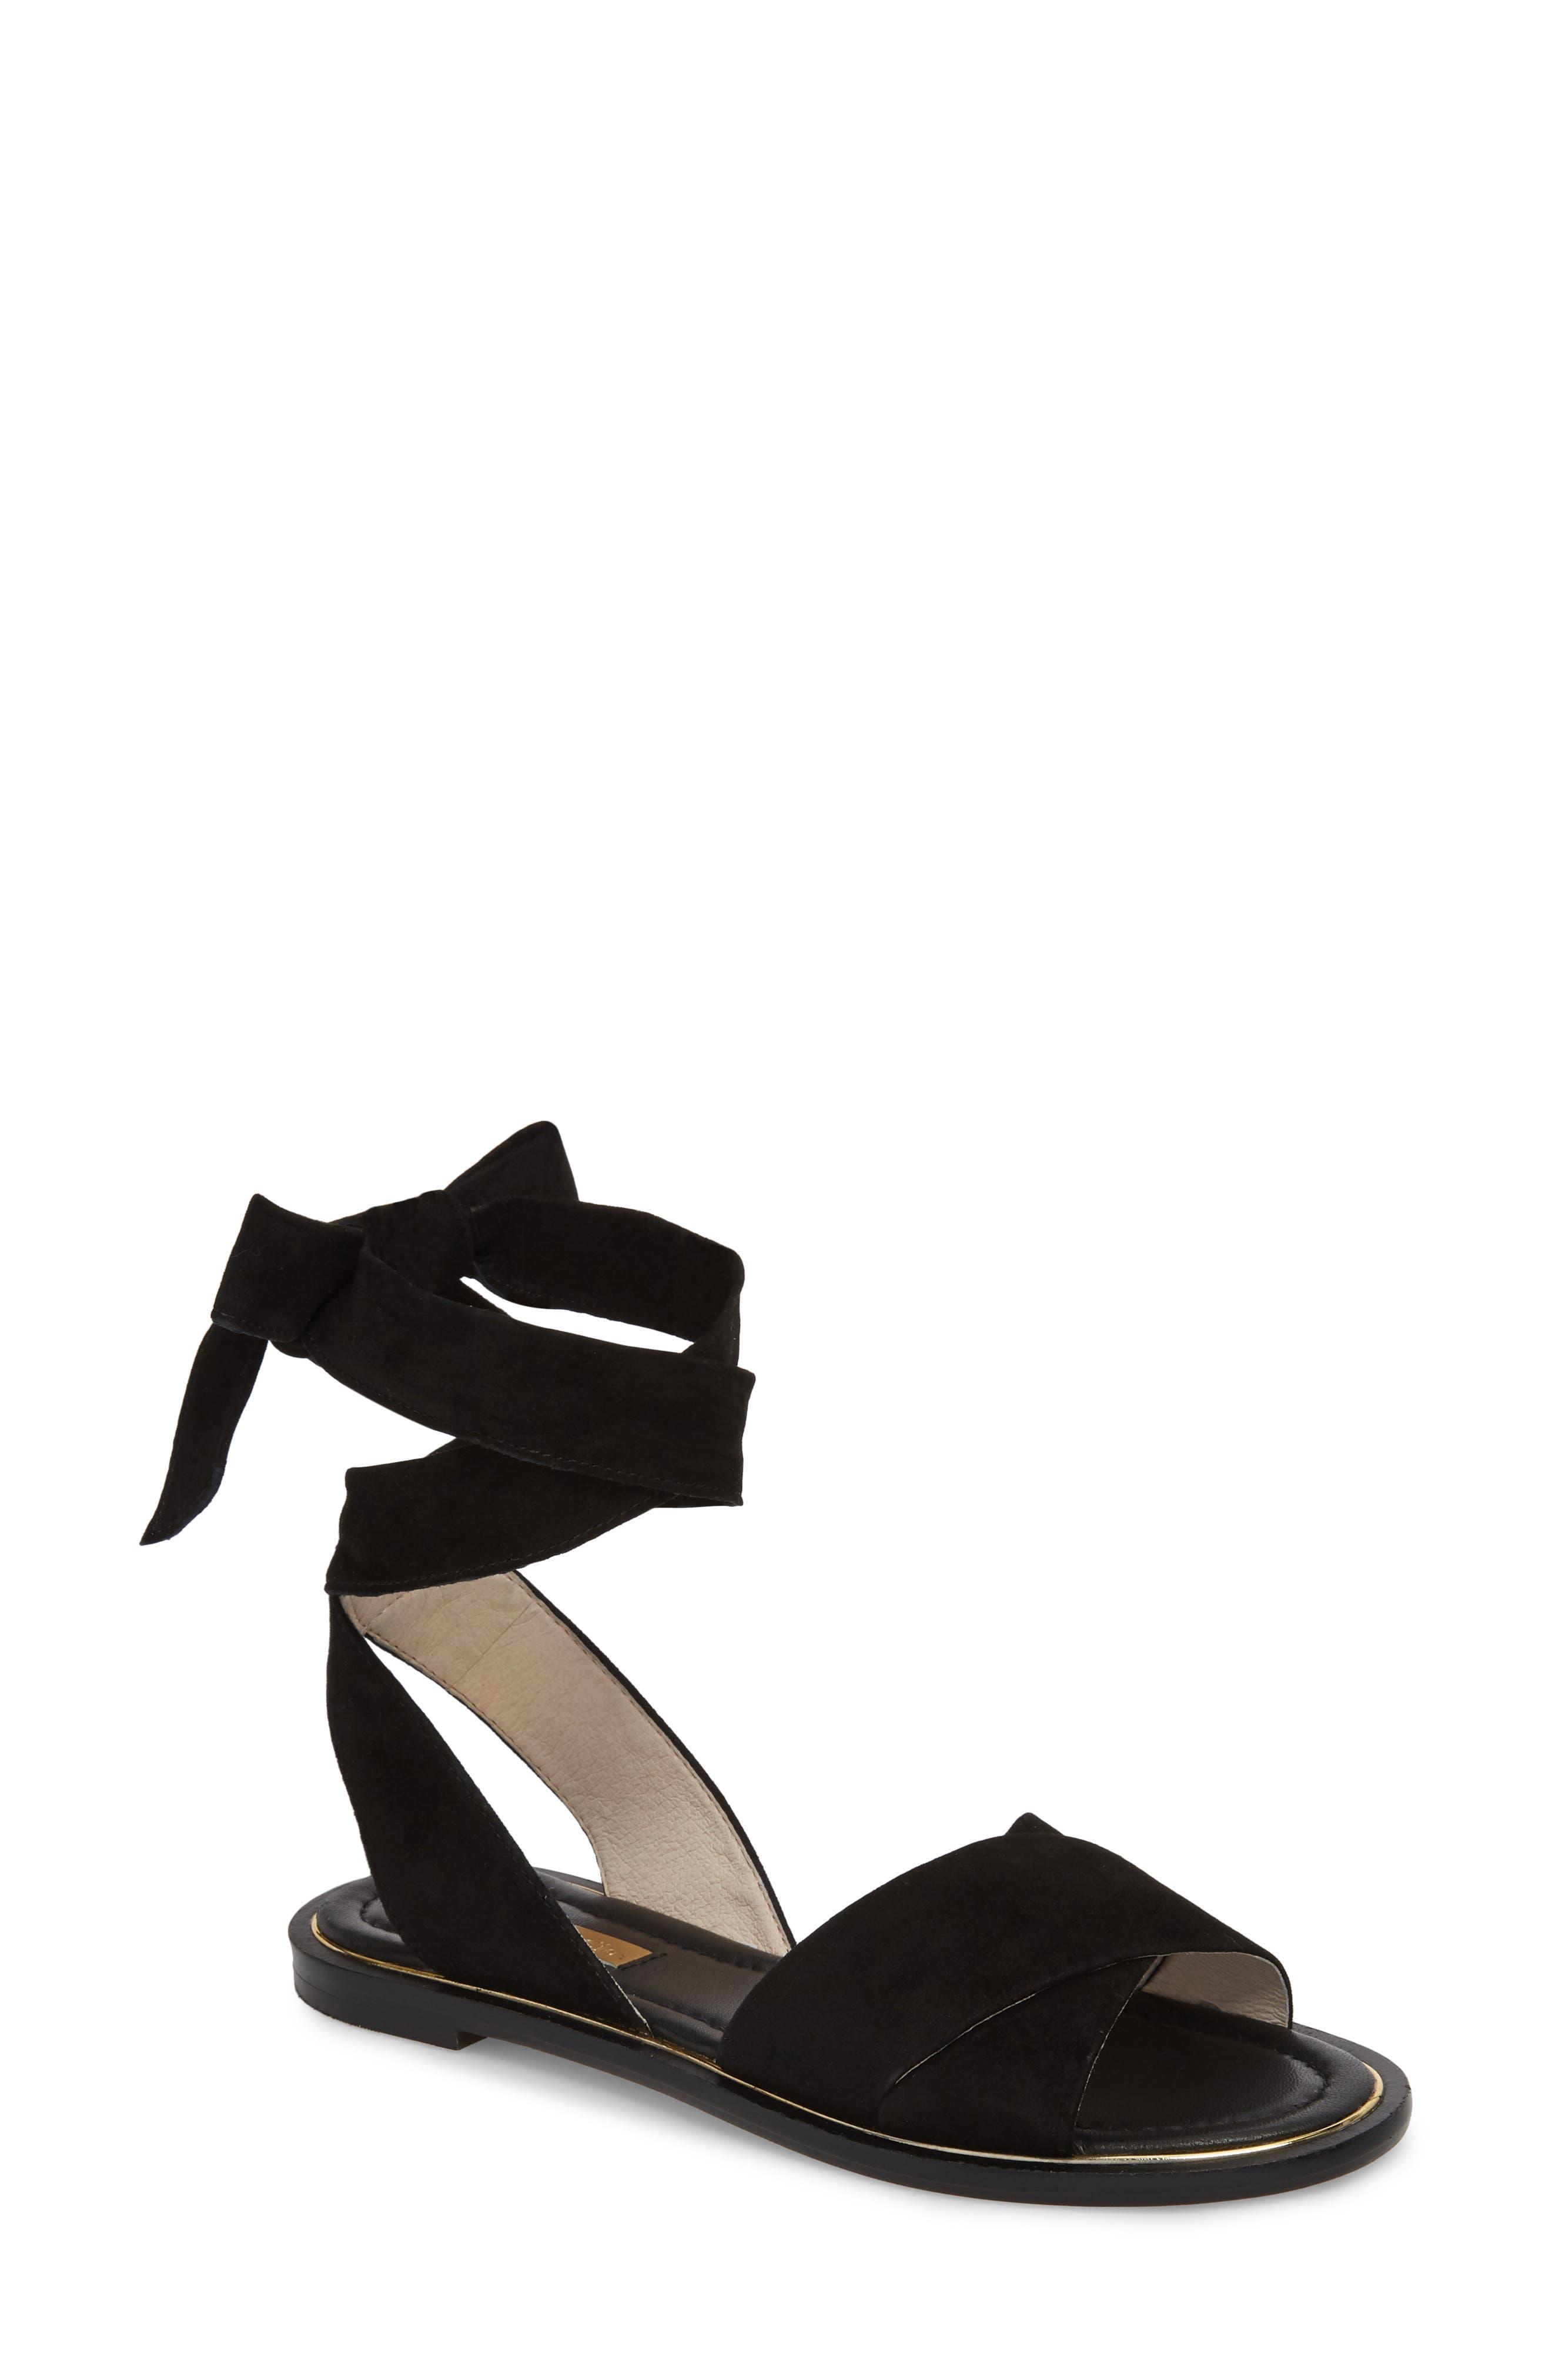 Biglia Ankle Wrap Sandal,                             Main thumbnail 1, color,                             Black Leather